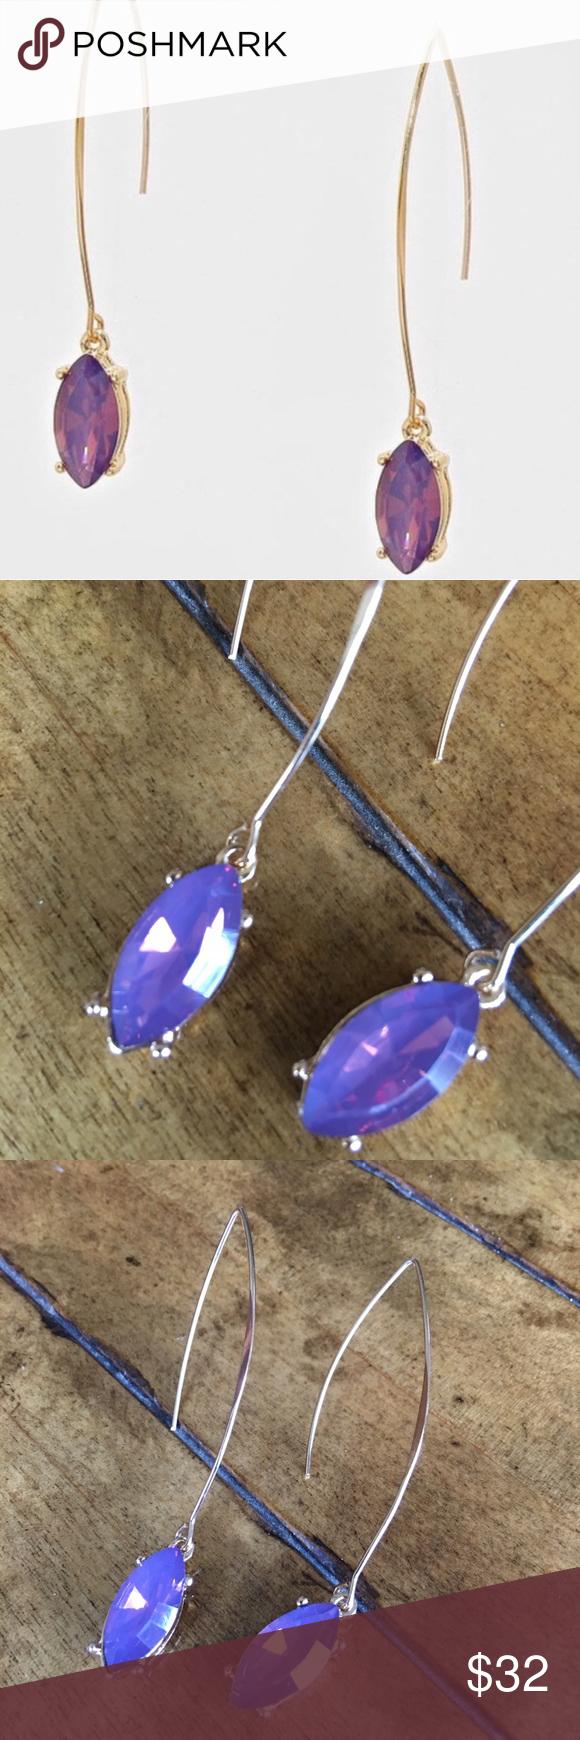 Purple hue  earrings